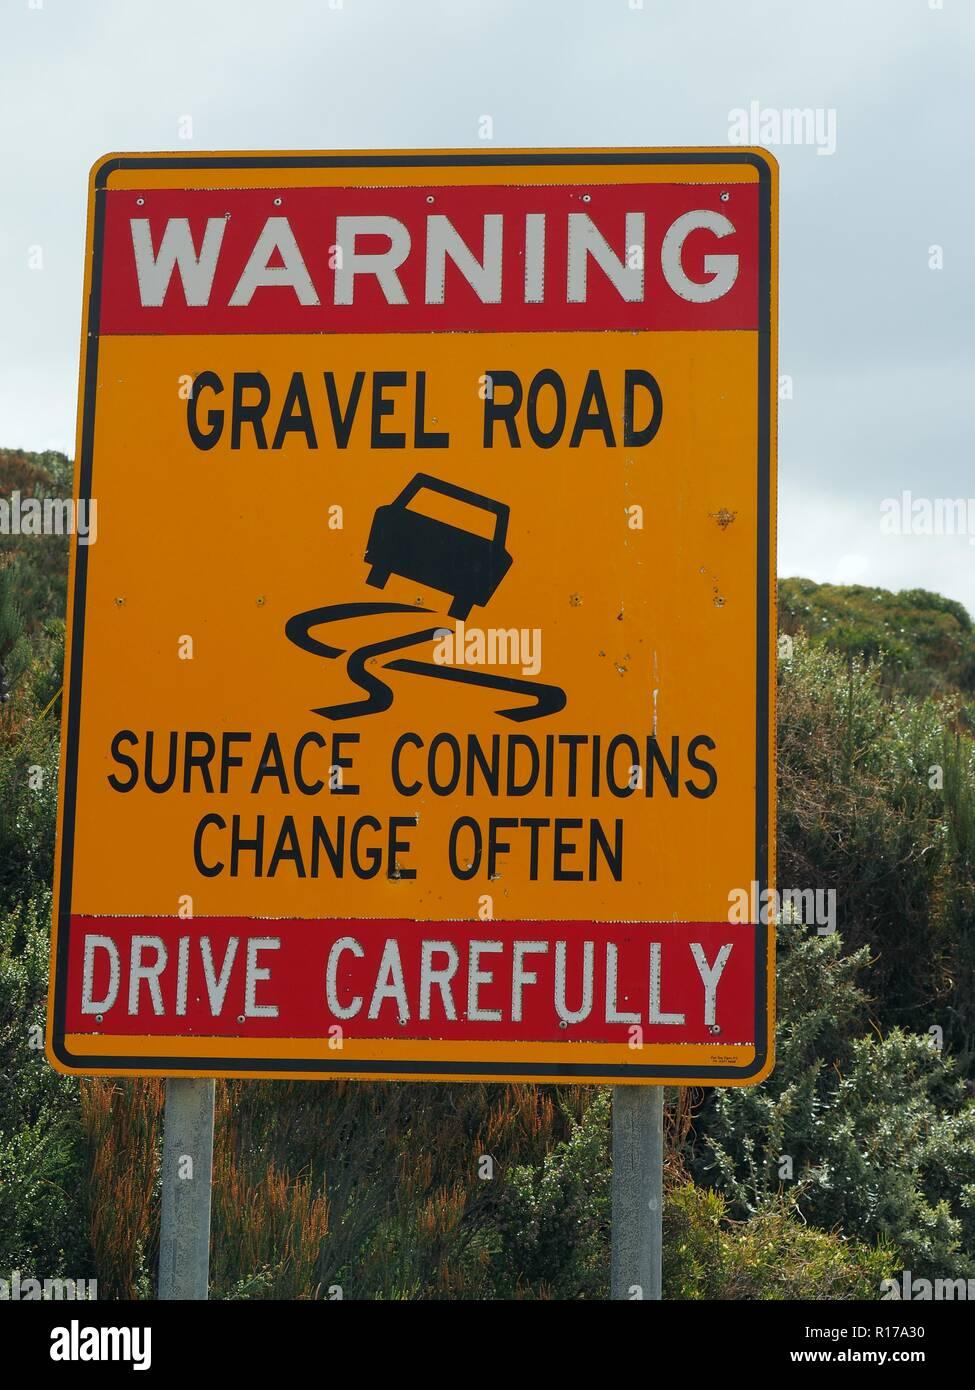 Gravel Road - Drive Carefully - Stock Image